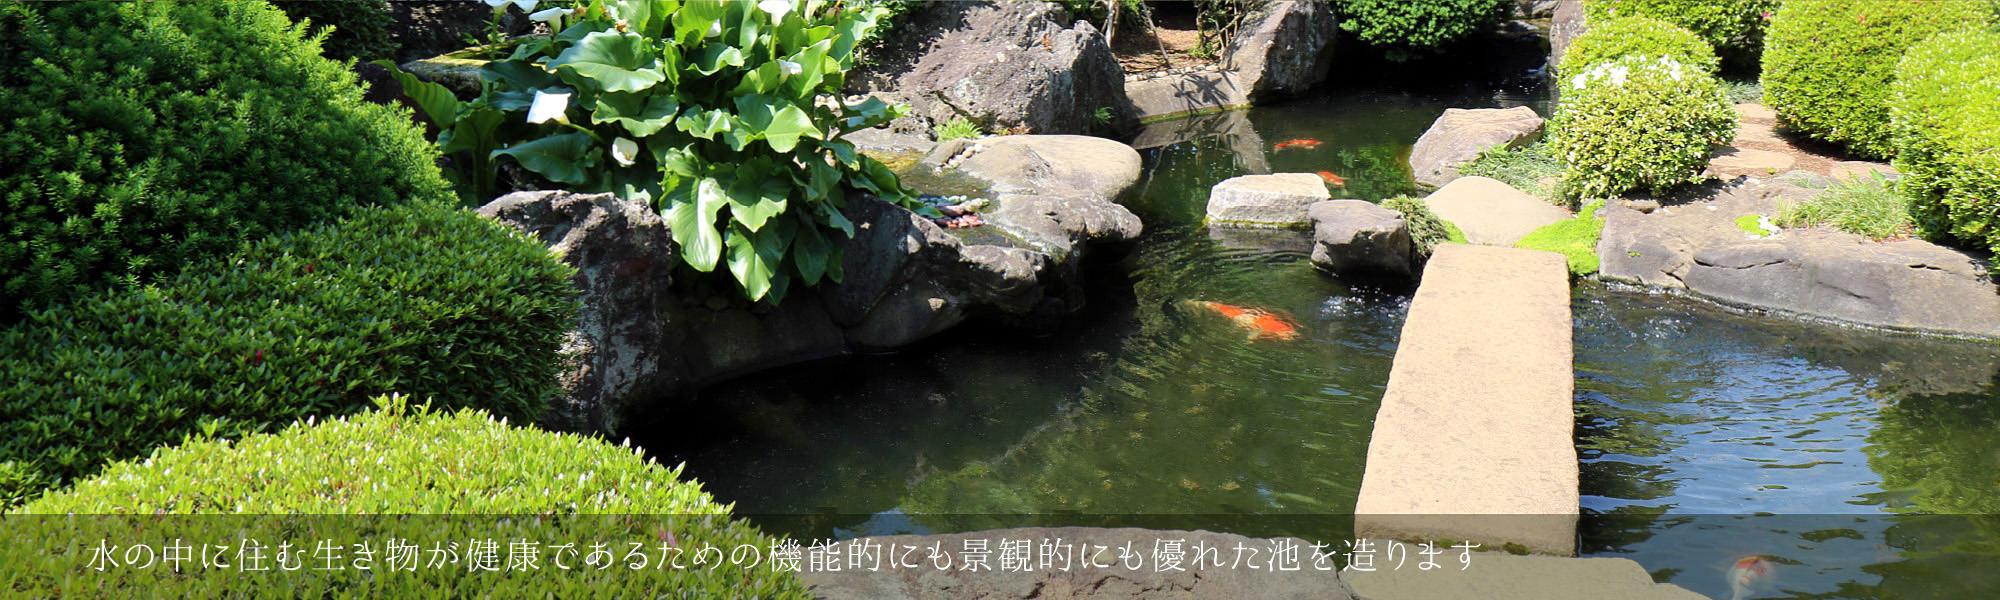 <a href='http://yakigaya-zouen.com/archives/666'></a>